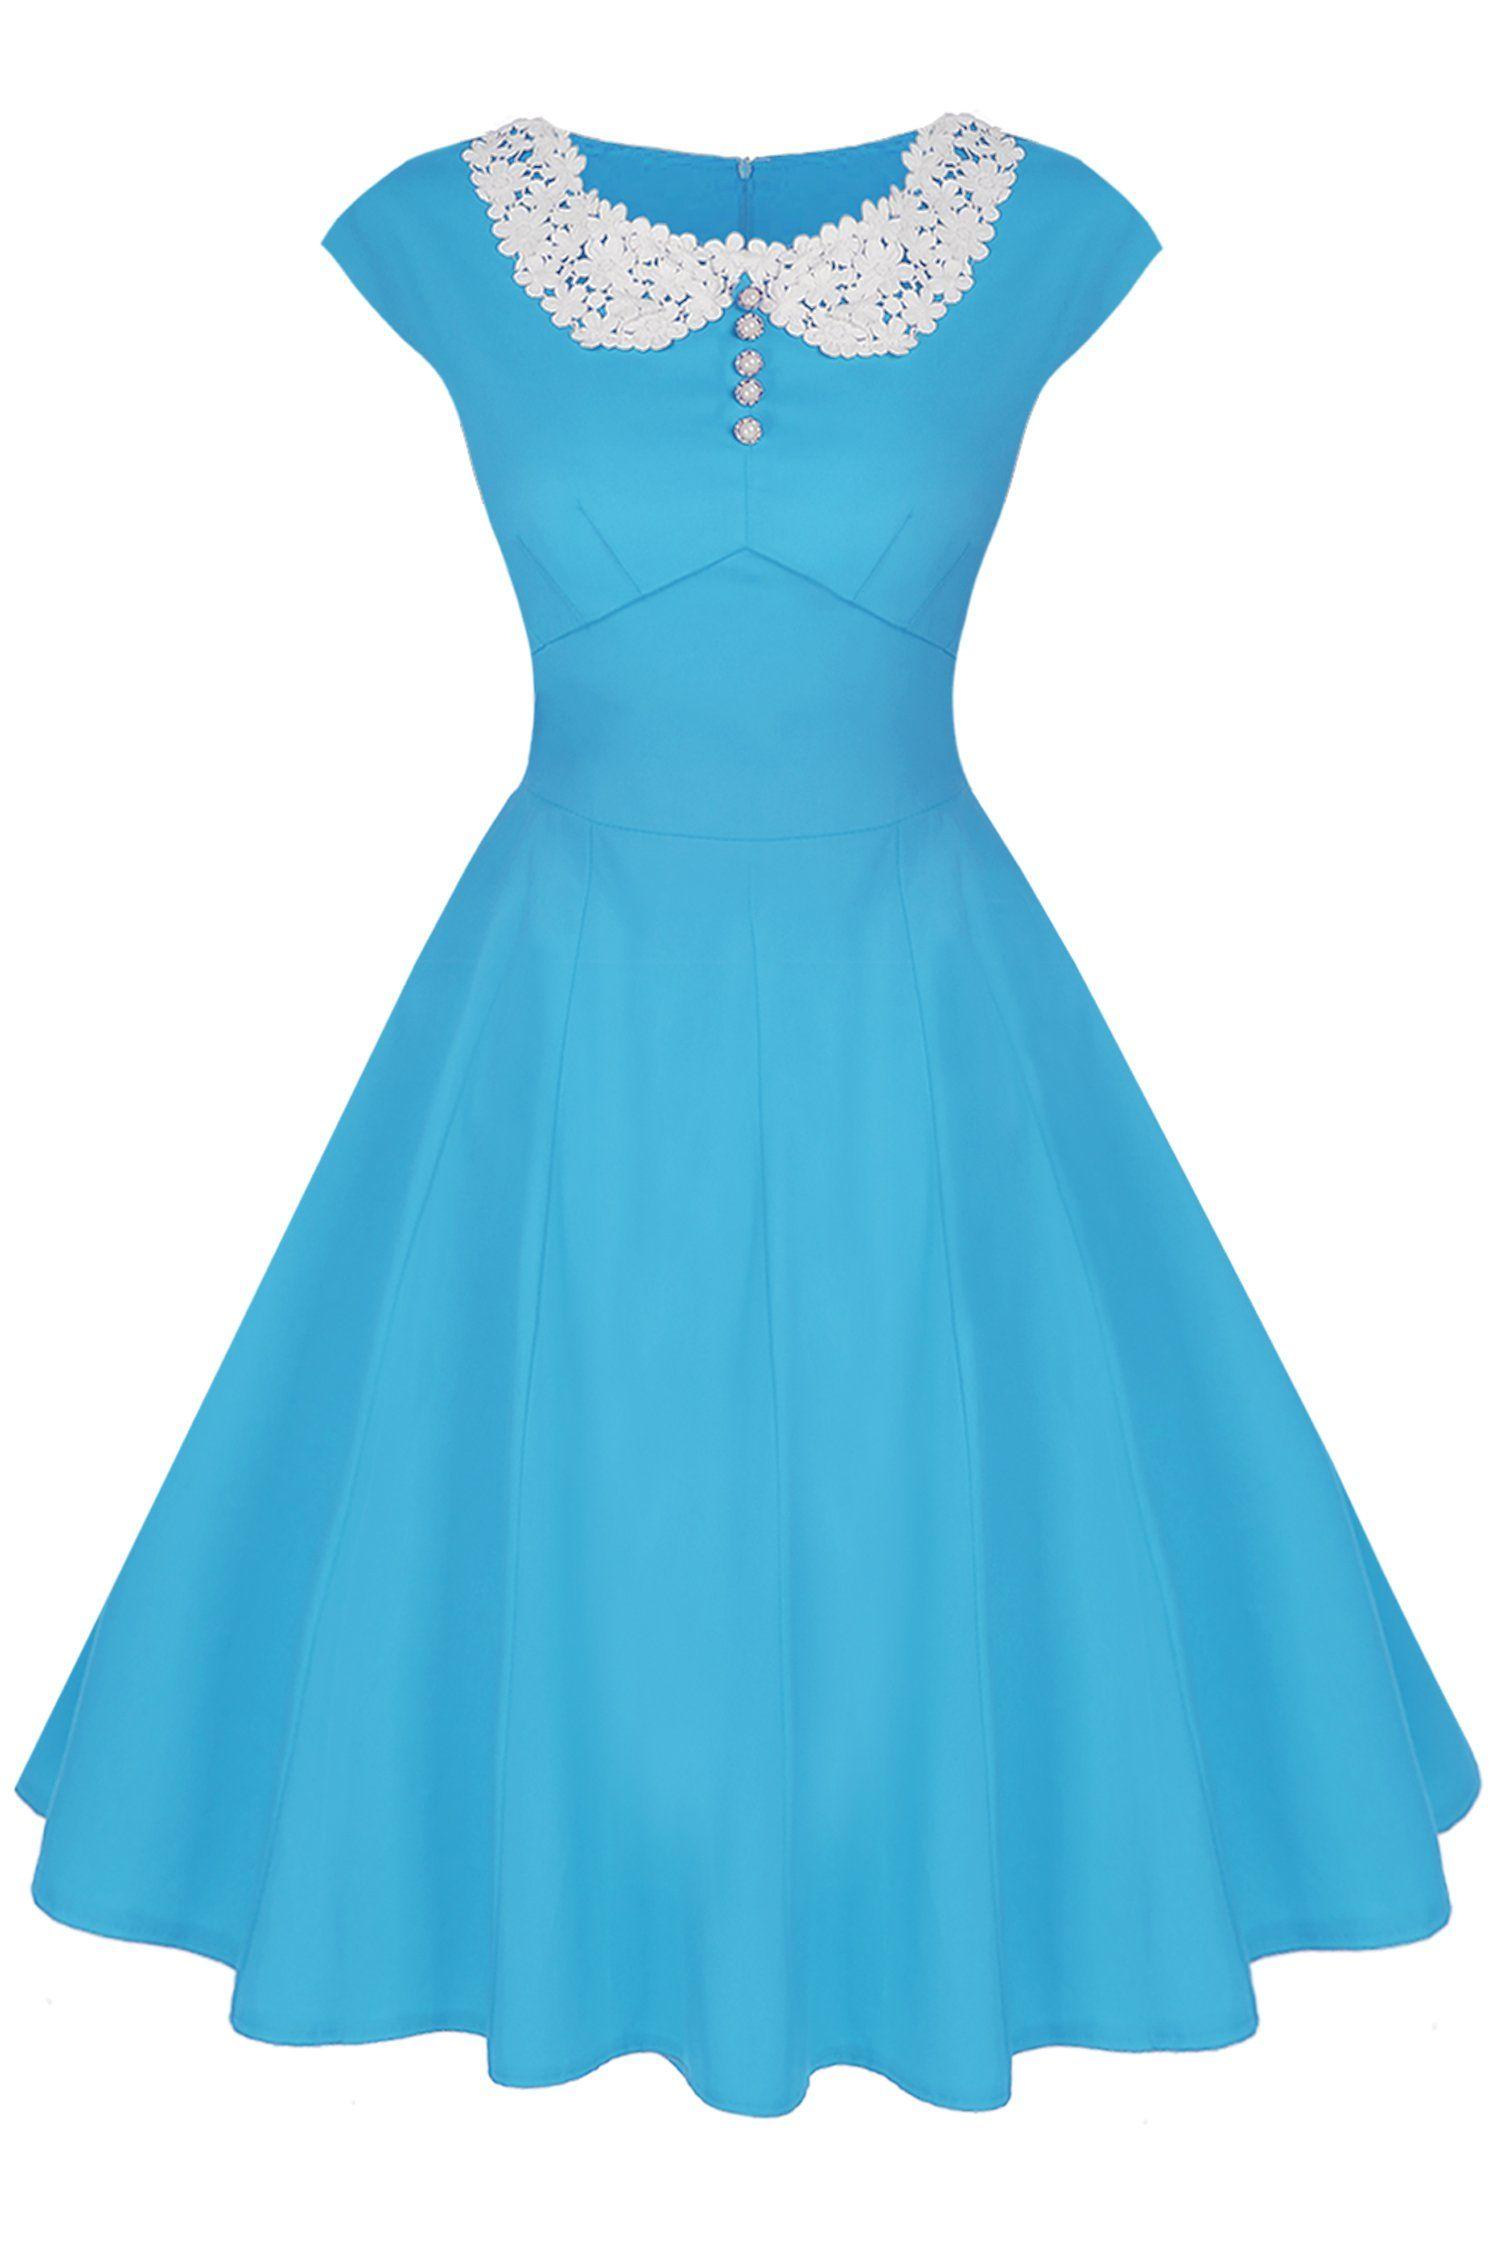 ACEVOG 40s 50s 60s Vintage Retro Swing Rockabilly Picnic Party Dress ...